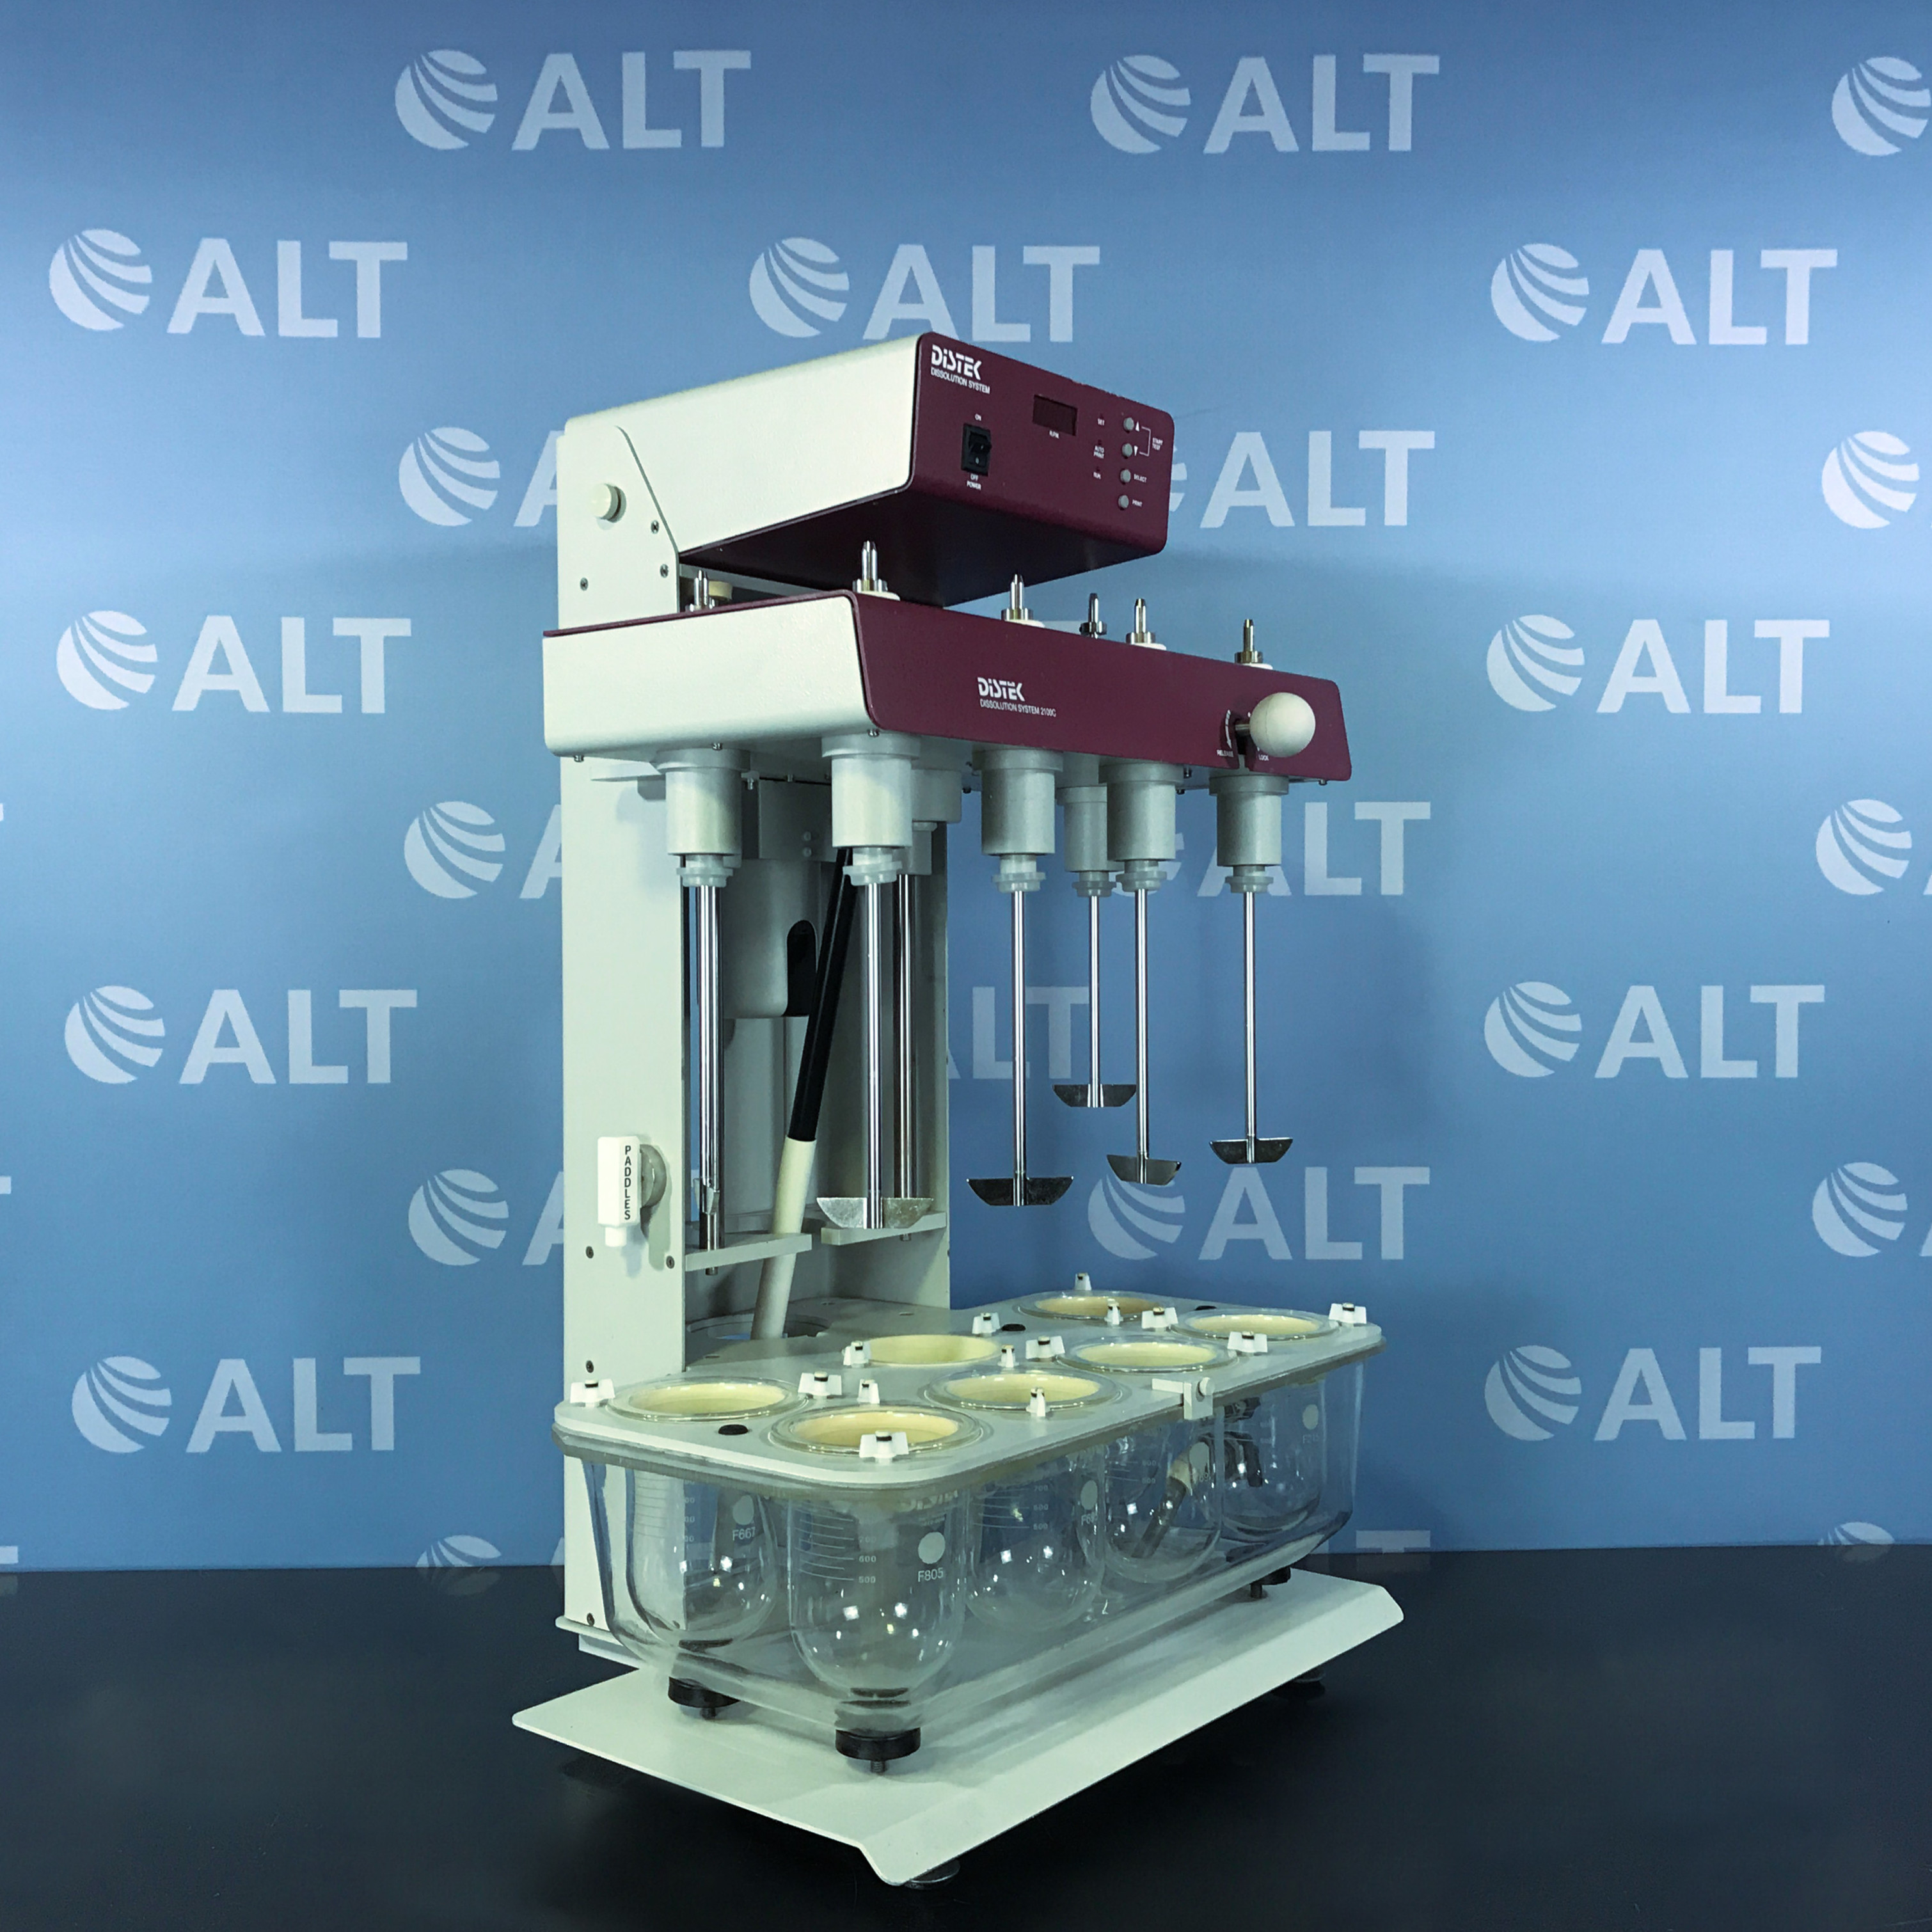 Distek 2100C Dissolution System with Agilent 8453 UV-Vis Spectroscopy System Image